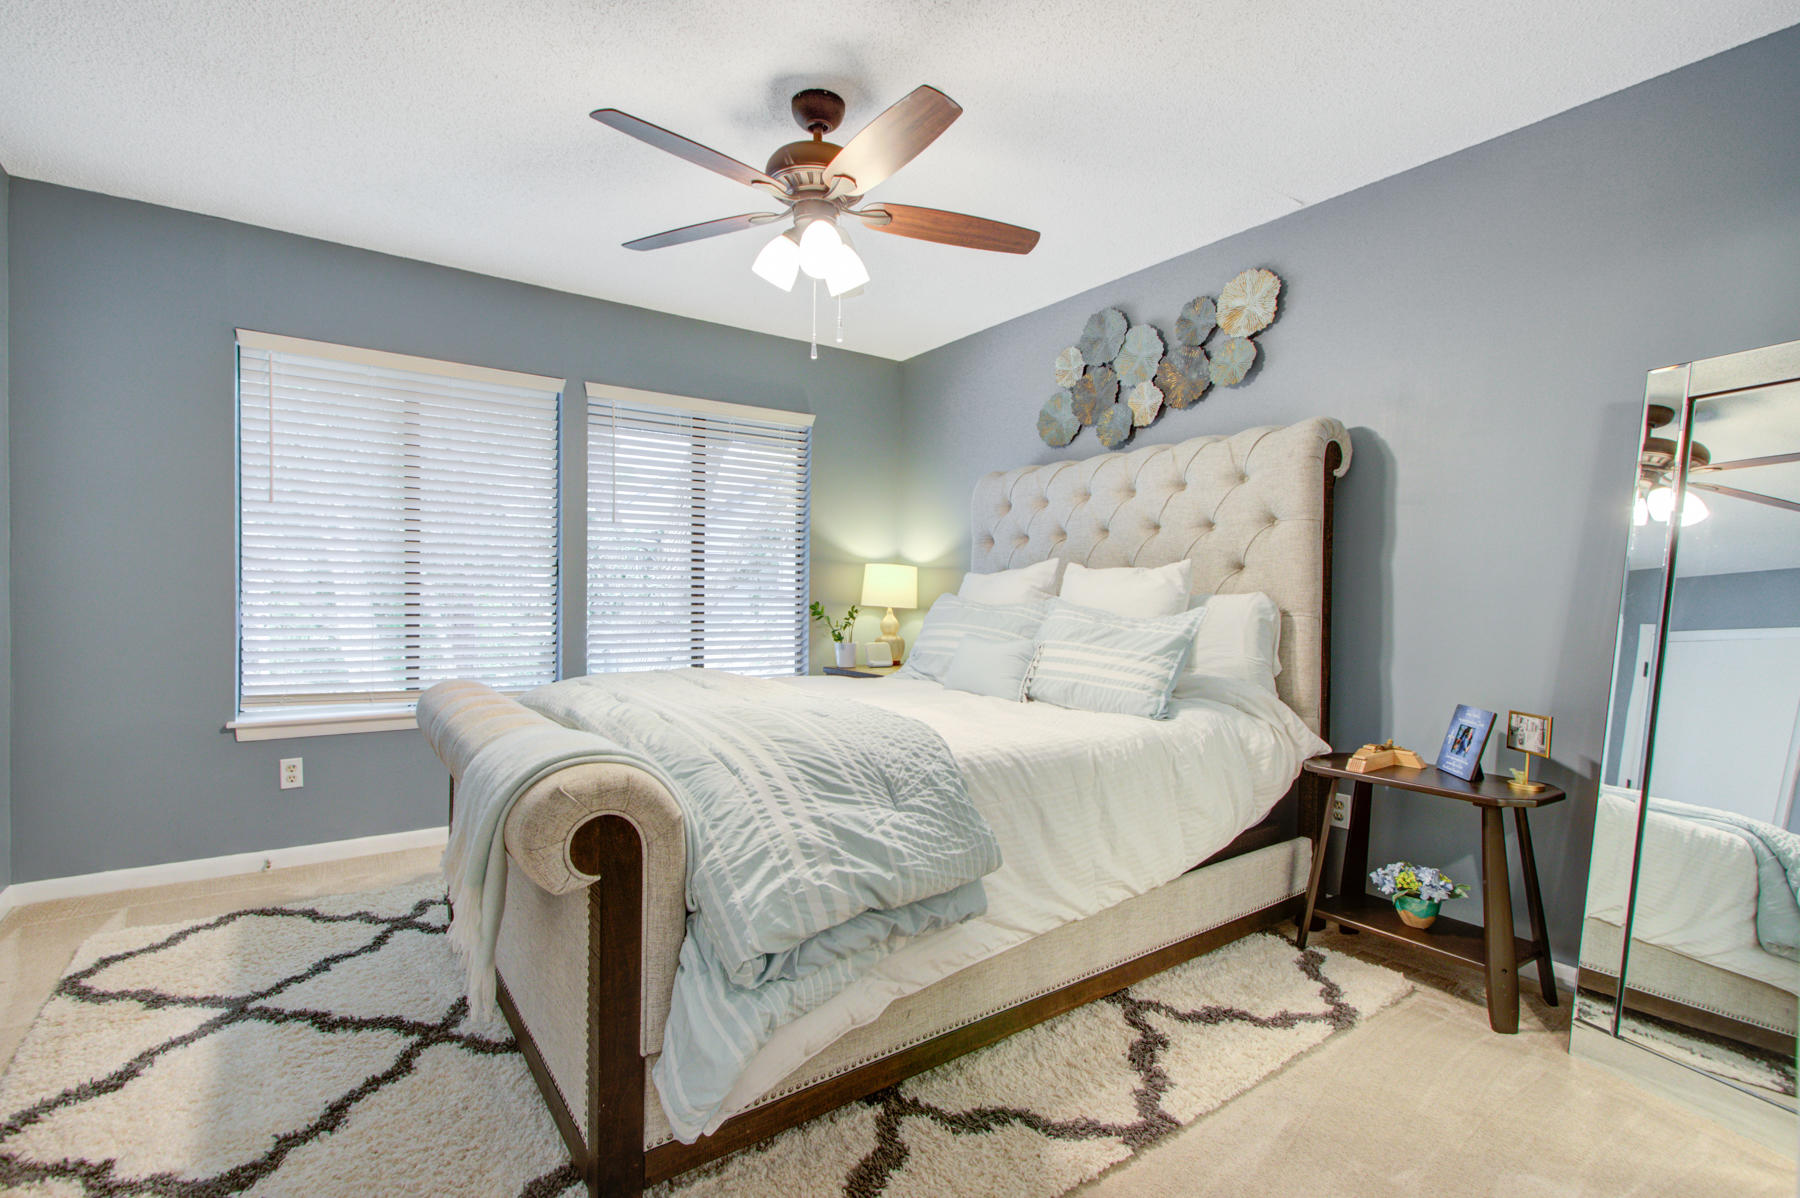 Snee Farm Lakes Homes For Sale - 1120 Hidden Cove, Mount Pleasant, SC - 11